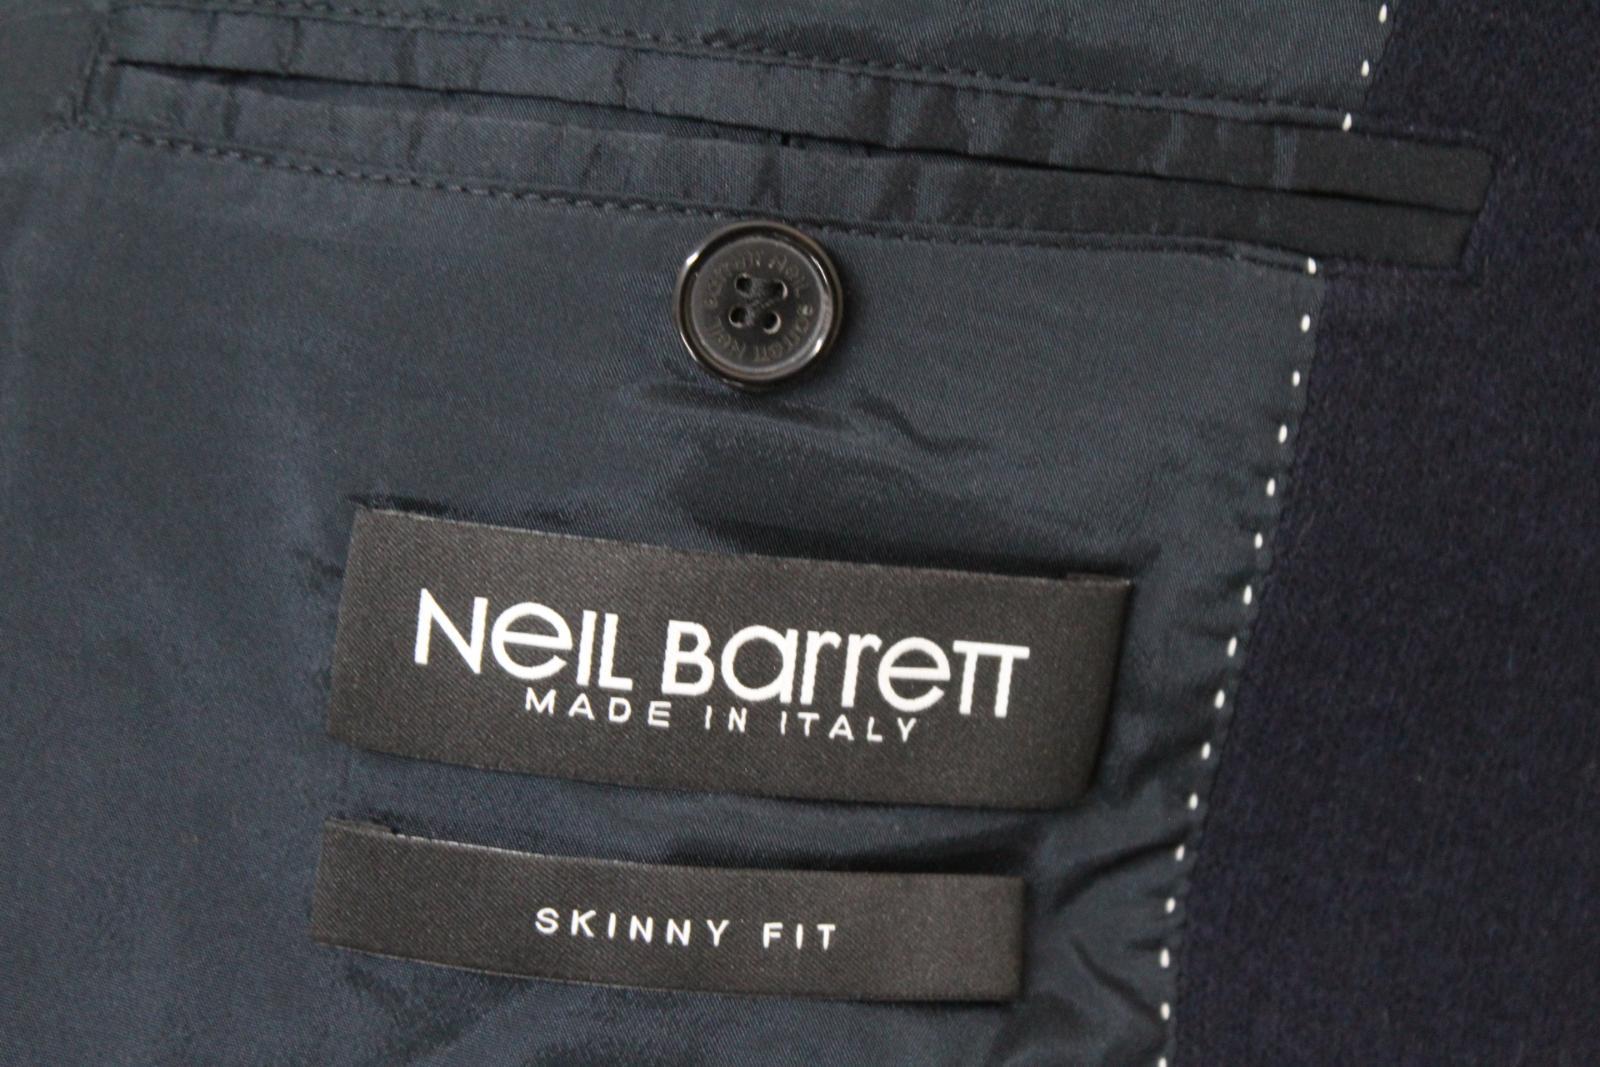 Neil-Barrett-Hombre-Azul-Marino-Imitacion-Cuero-Chaqueta-Blazer-Manga-IT50-UK40 miniatura 8